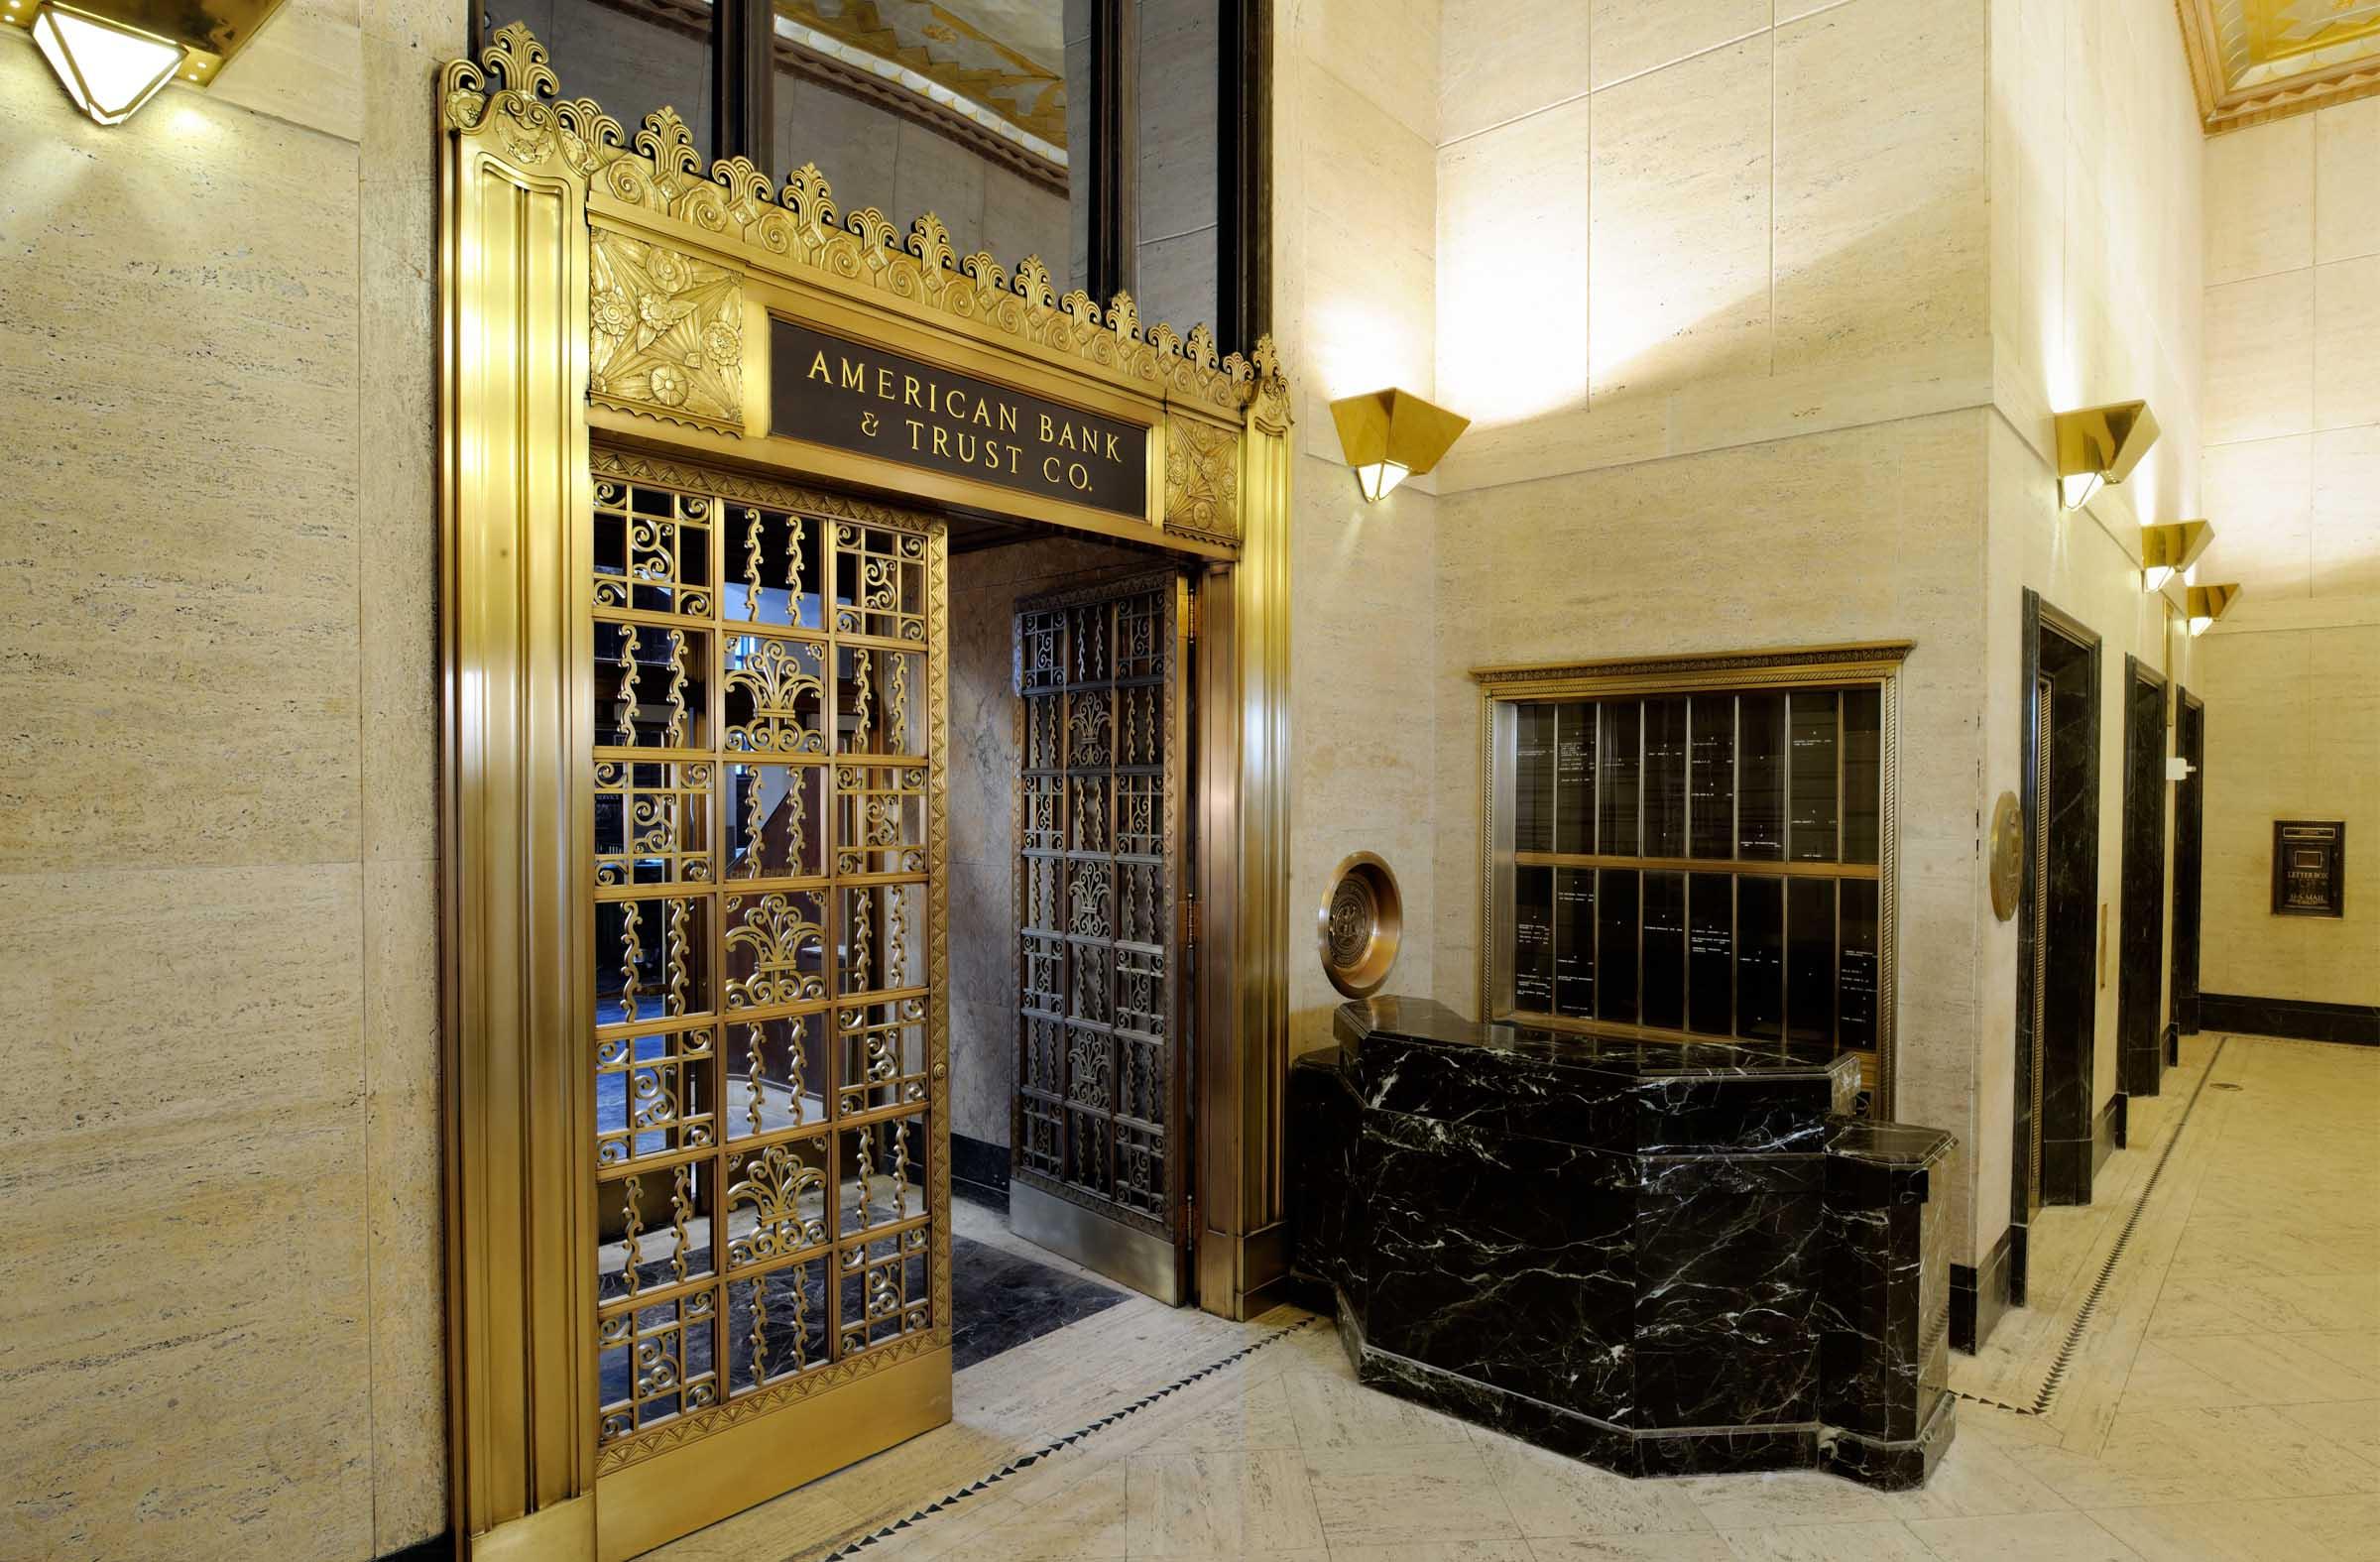 200 Carondelet lobby